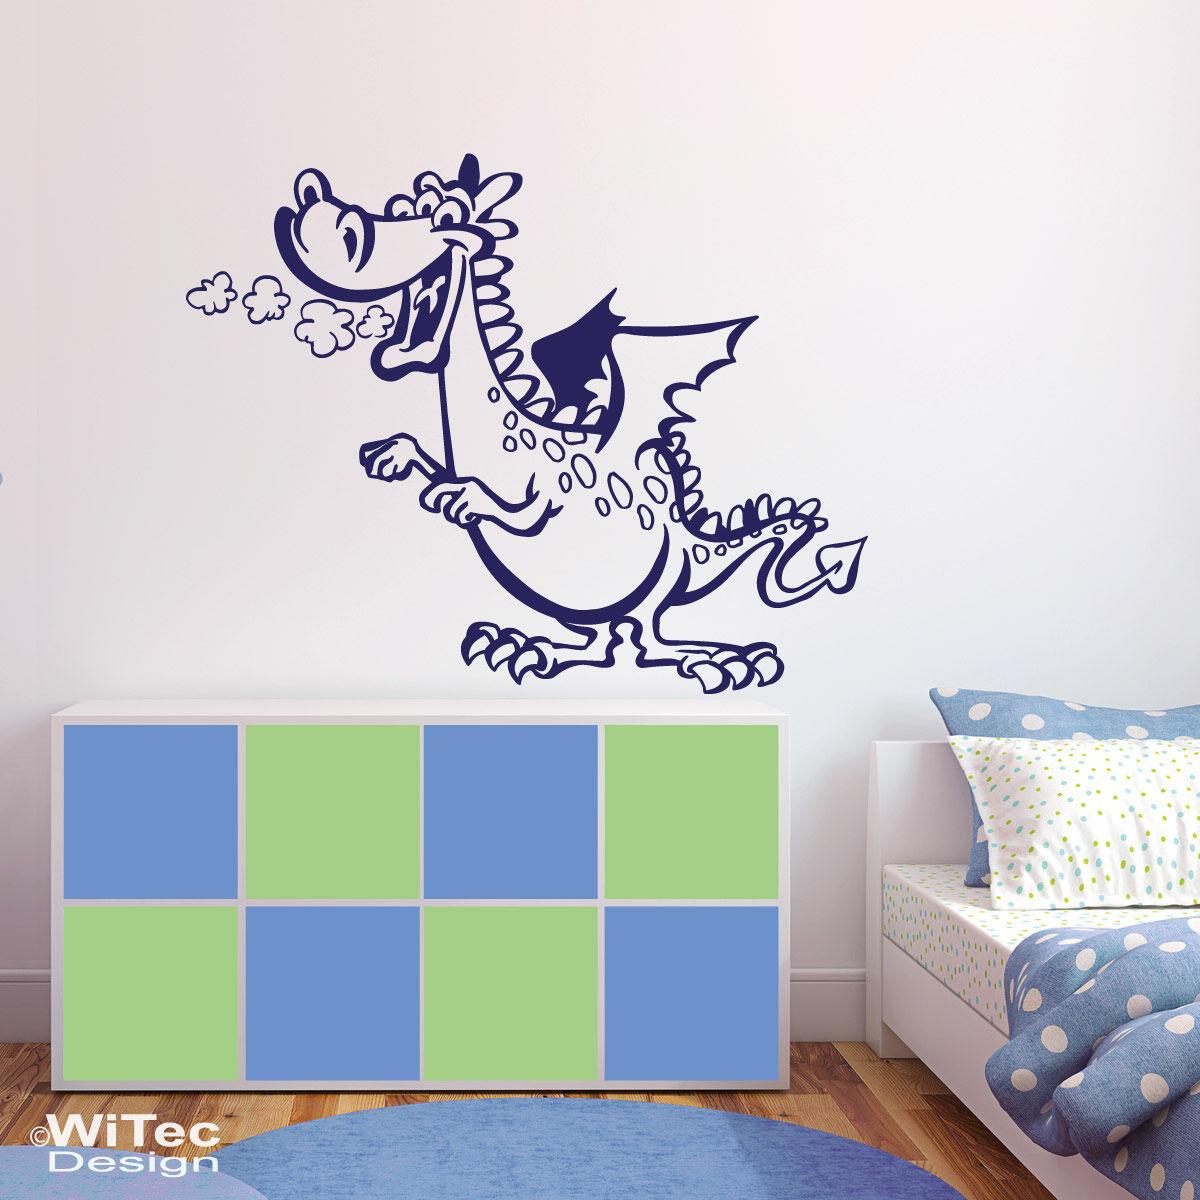 wn271 wandaufkleber drache wandtattoo kinderzimmer. Black Bedroom Furniture Sets. Home Design Ideas